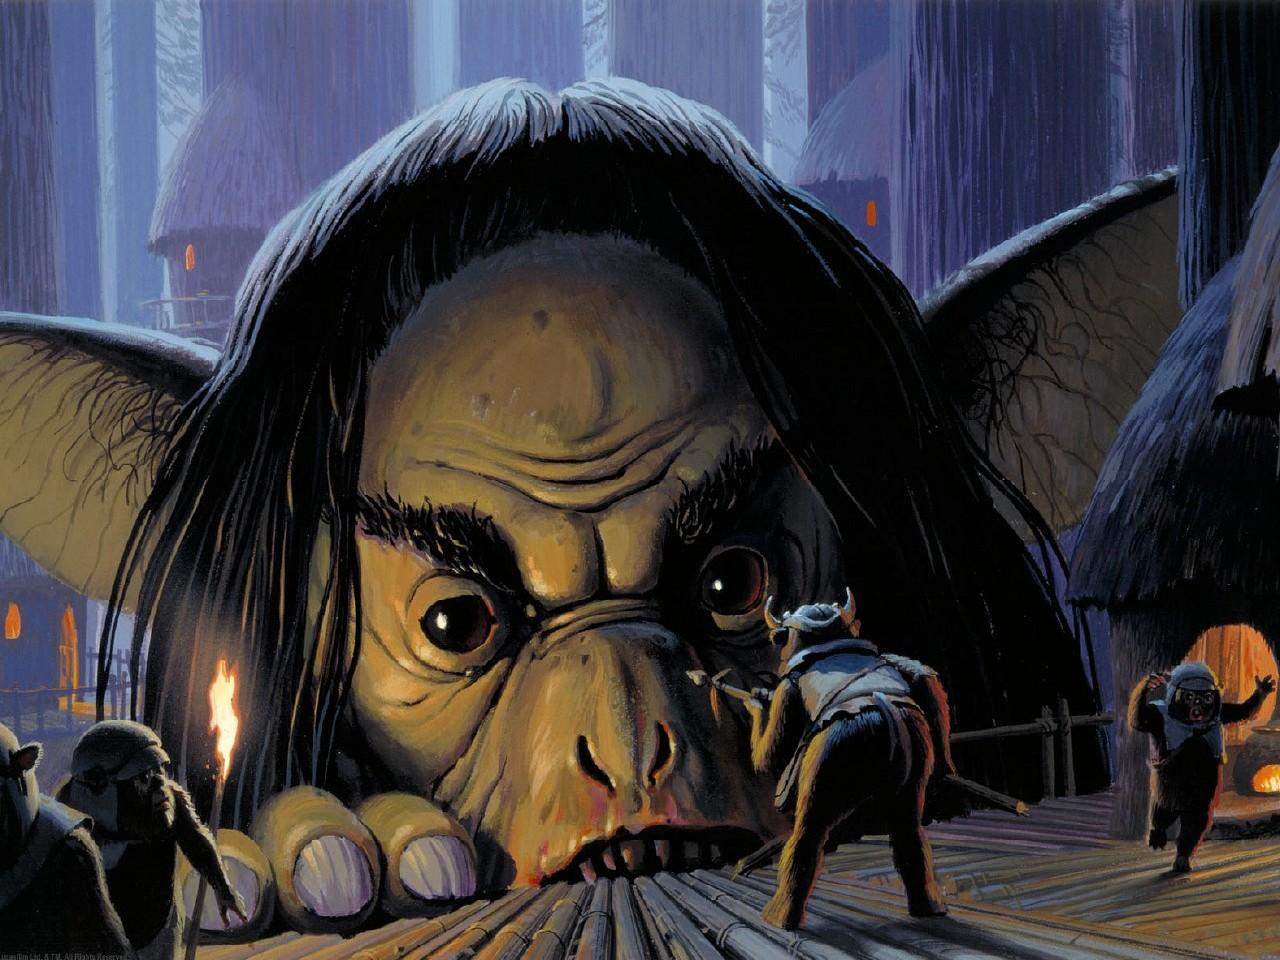 http://3.bp.blogspot.com/-TjY7Q247CTk/T1kIgyLIT6I/AAAAAAAAAD0/a-GhoMV-OZE/s1600/Concepcion-artistica-de-un-Gorax-por-Ralph-McQuarrie.jpg